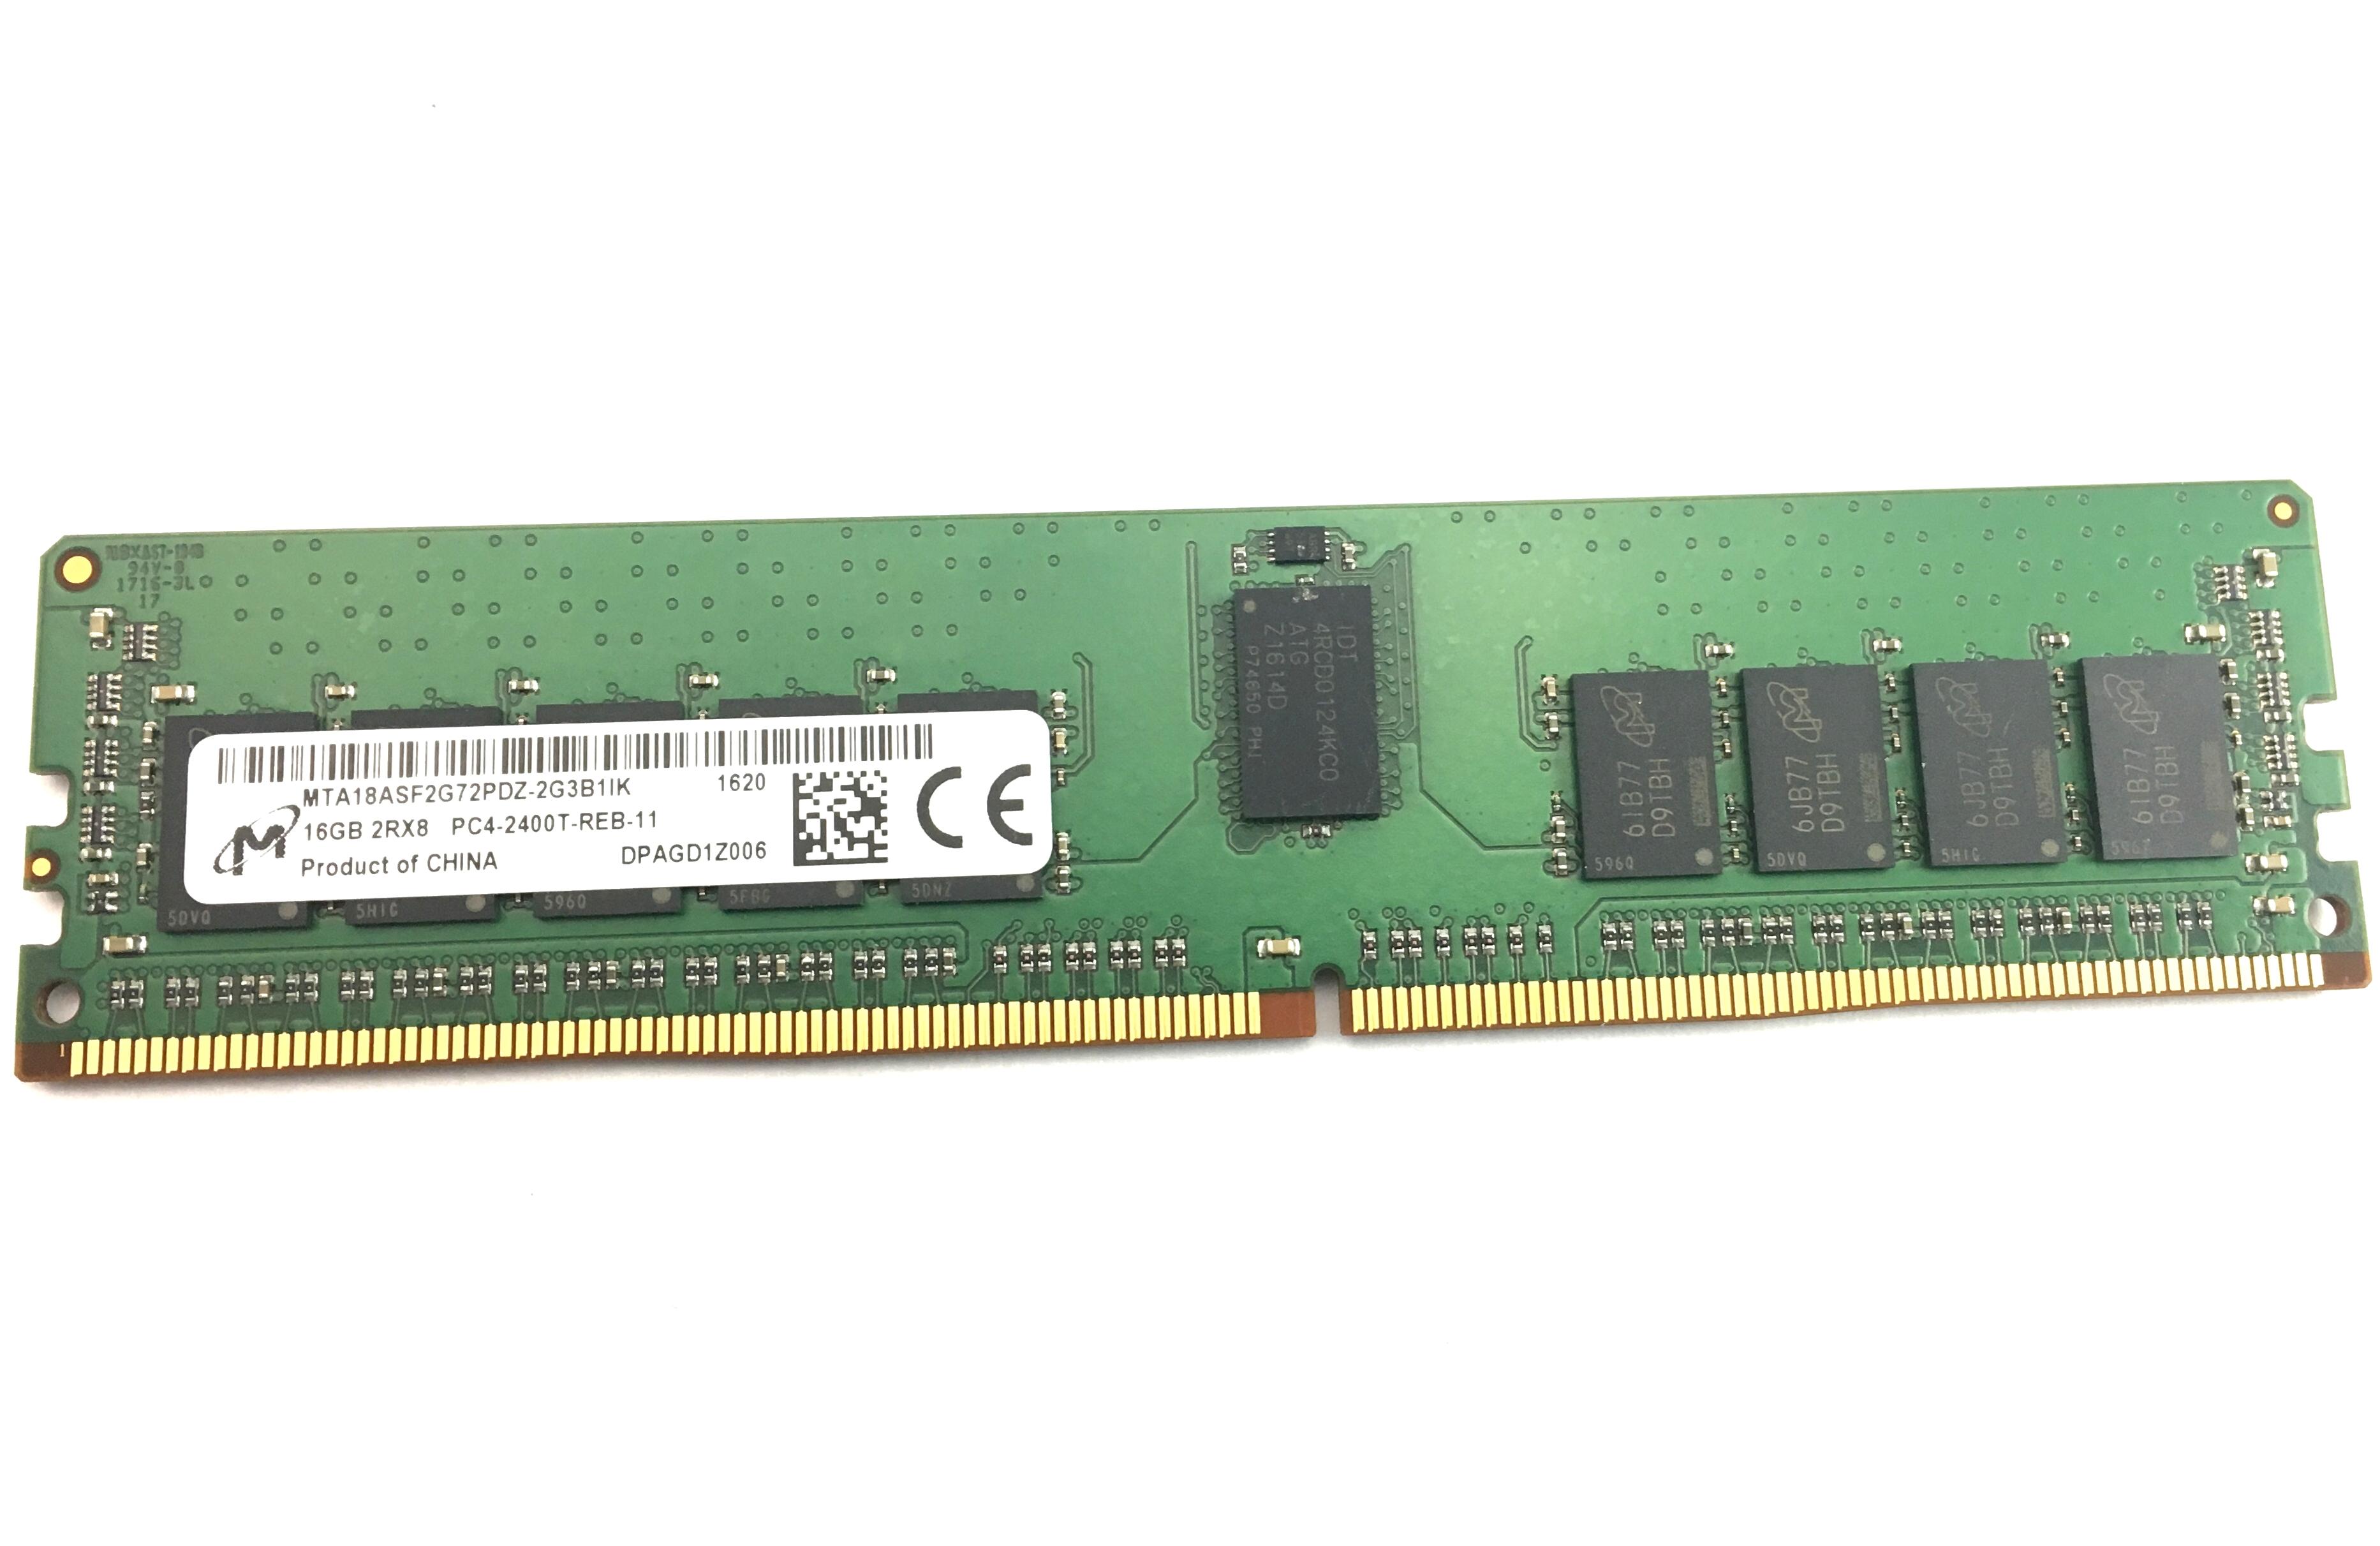 Micron 16GB 2Rx8 PC4 2400T DDR4 ECC Registered Memory (MTA18ASF2G72PDZ-2G3B1IK)